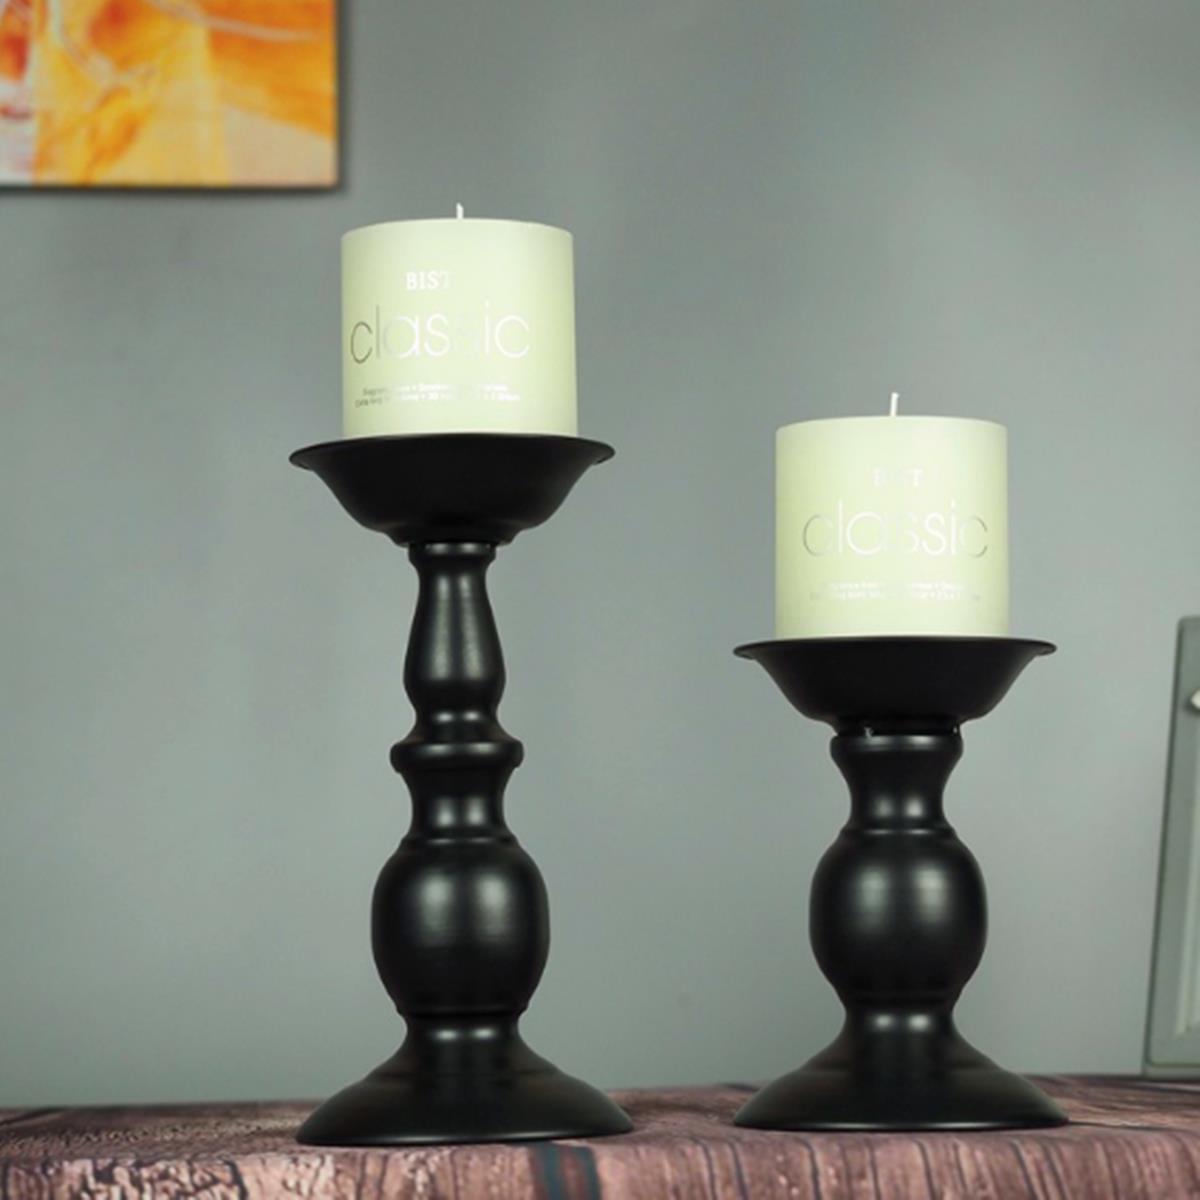 2Pcs Vintage Carved Pillar Candle Holder Candlesticks Stand Wedding Party Decor Black